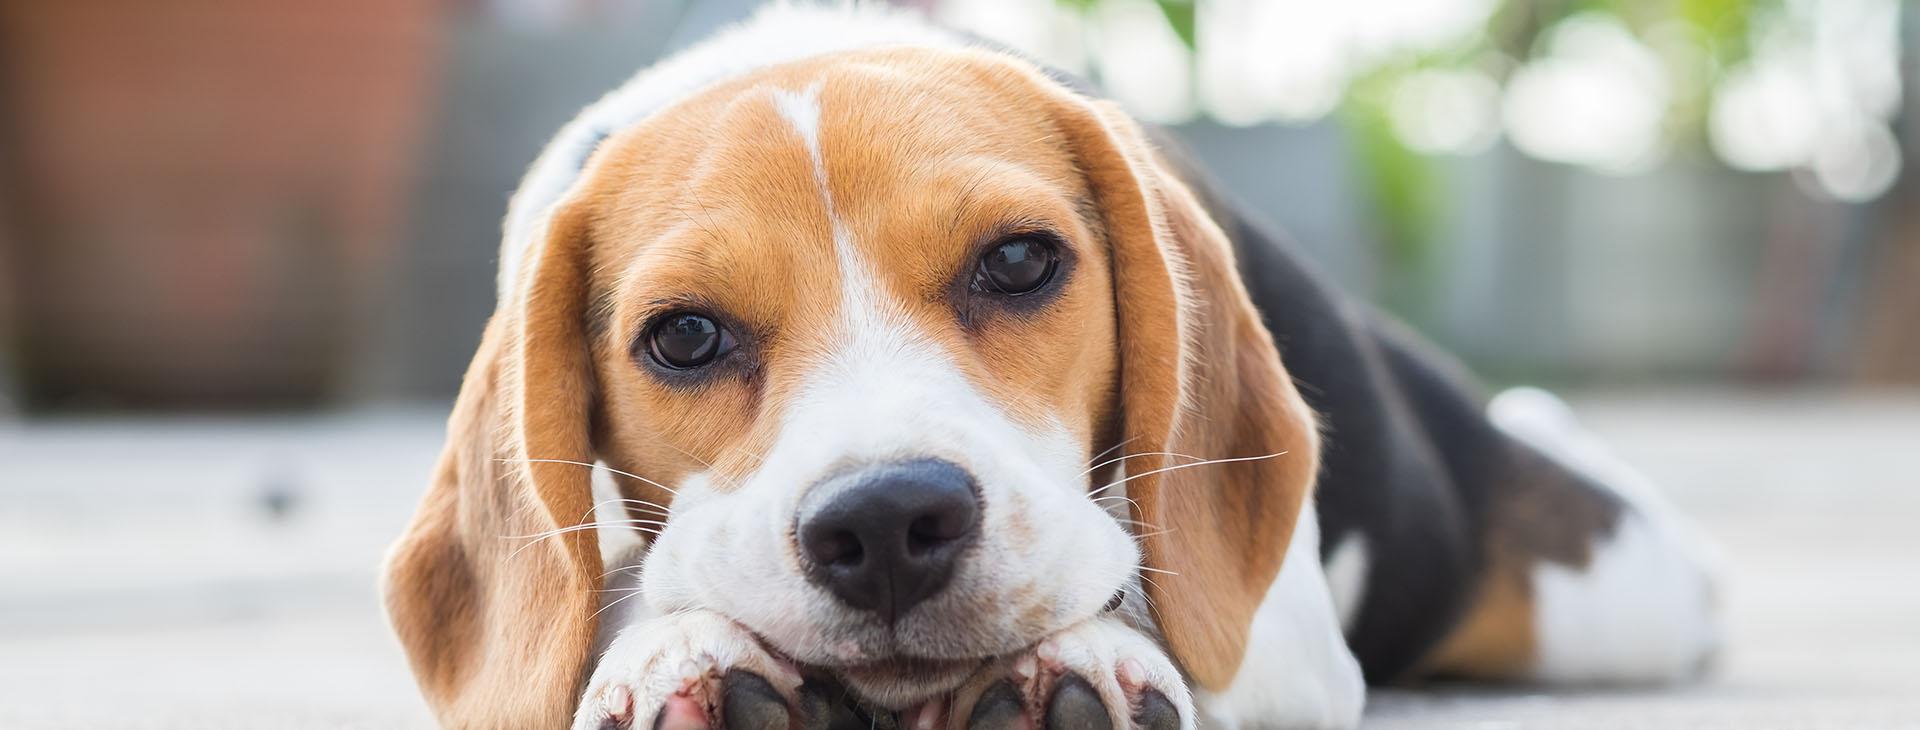 beagle puppy laying on ground